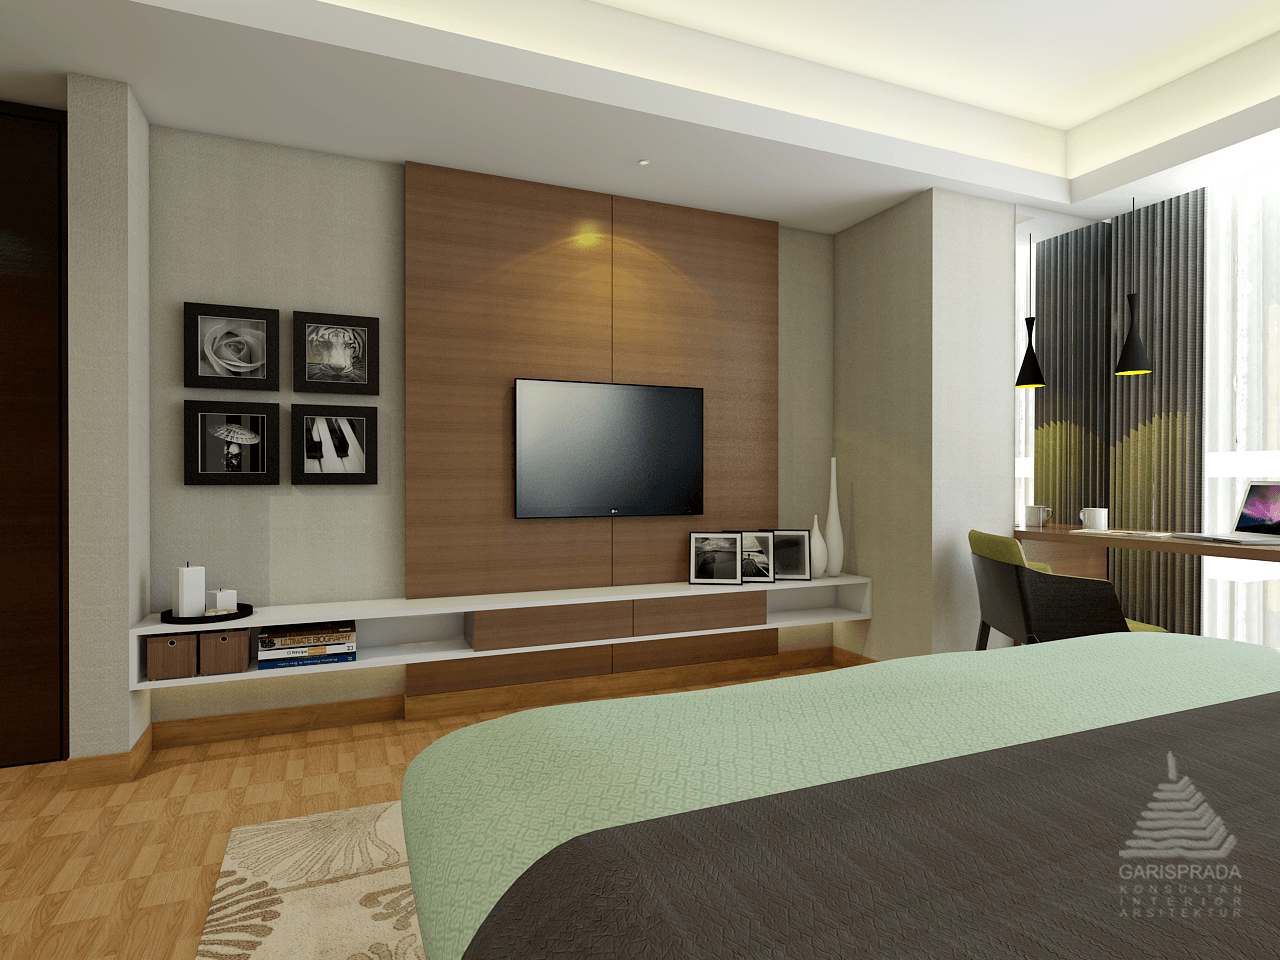 Pt. Garisprada Setiabudi Skygarden Apartmen Setiabudi, South Jakarta City, Jakarta, Indonesia Setiabudi Jakarta Bedroom Skandinavia  25401